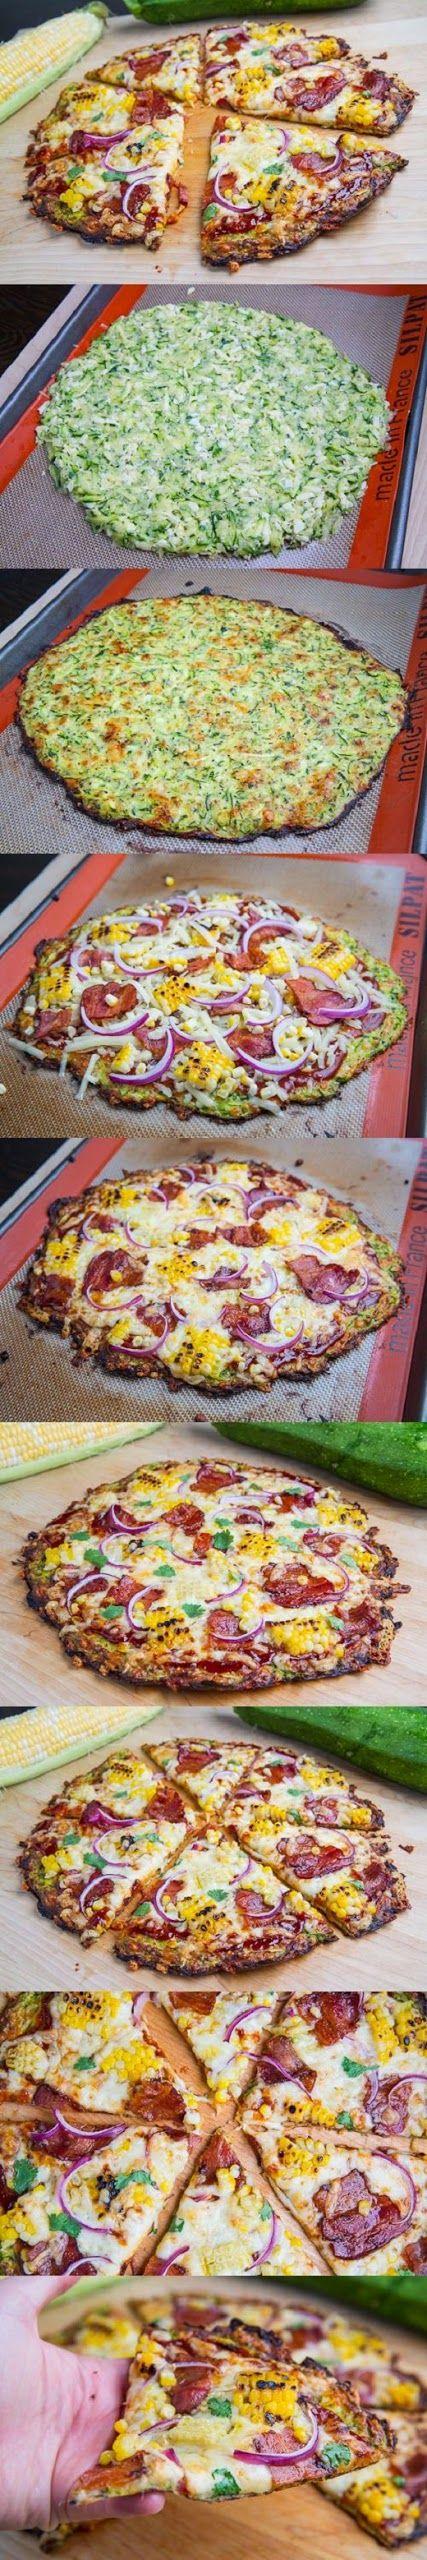 How To Make Zucchini Pizza Crust | Food Blog